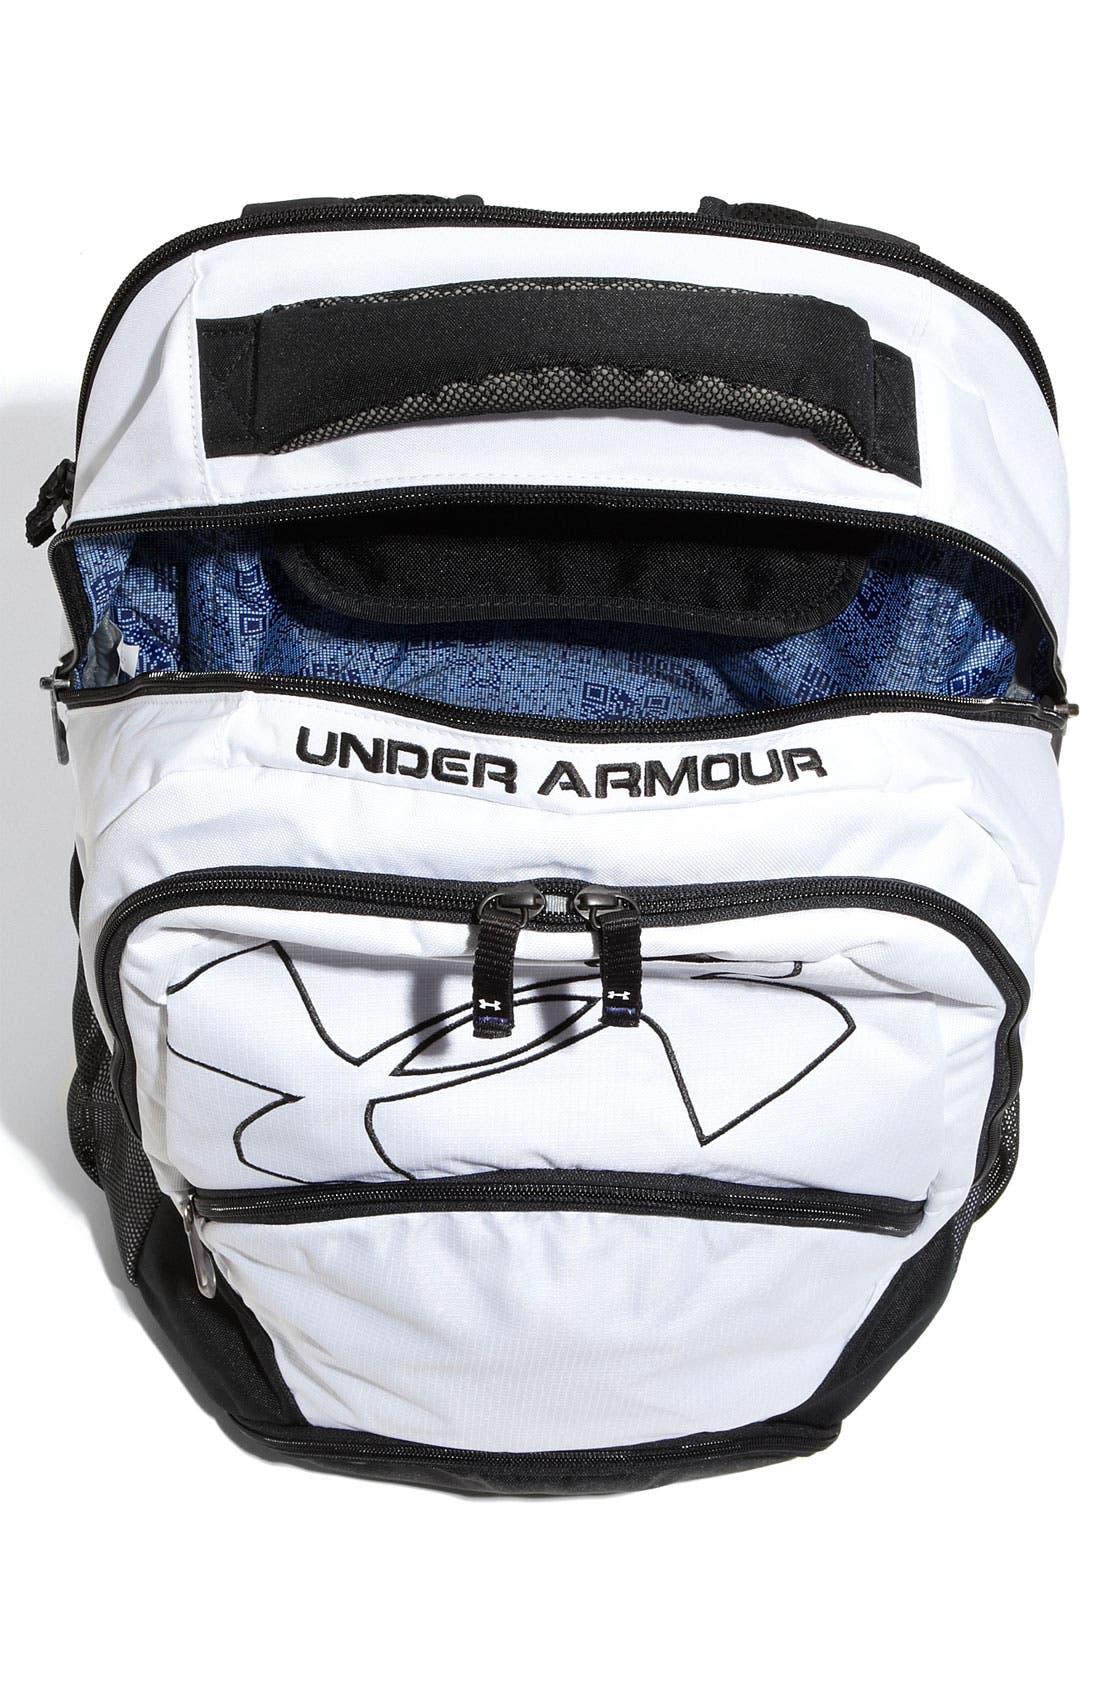 Alternate Image 2  - Under Armour 'Protego' Backpack